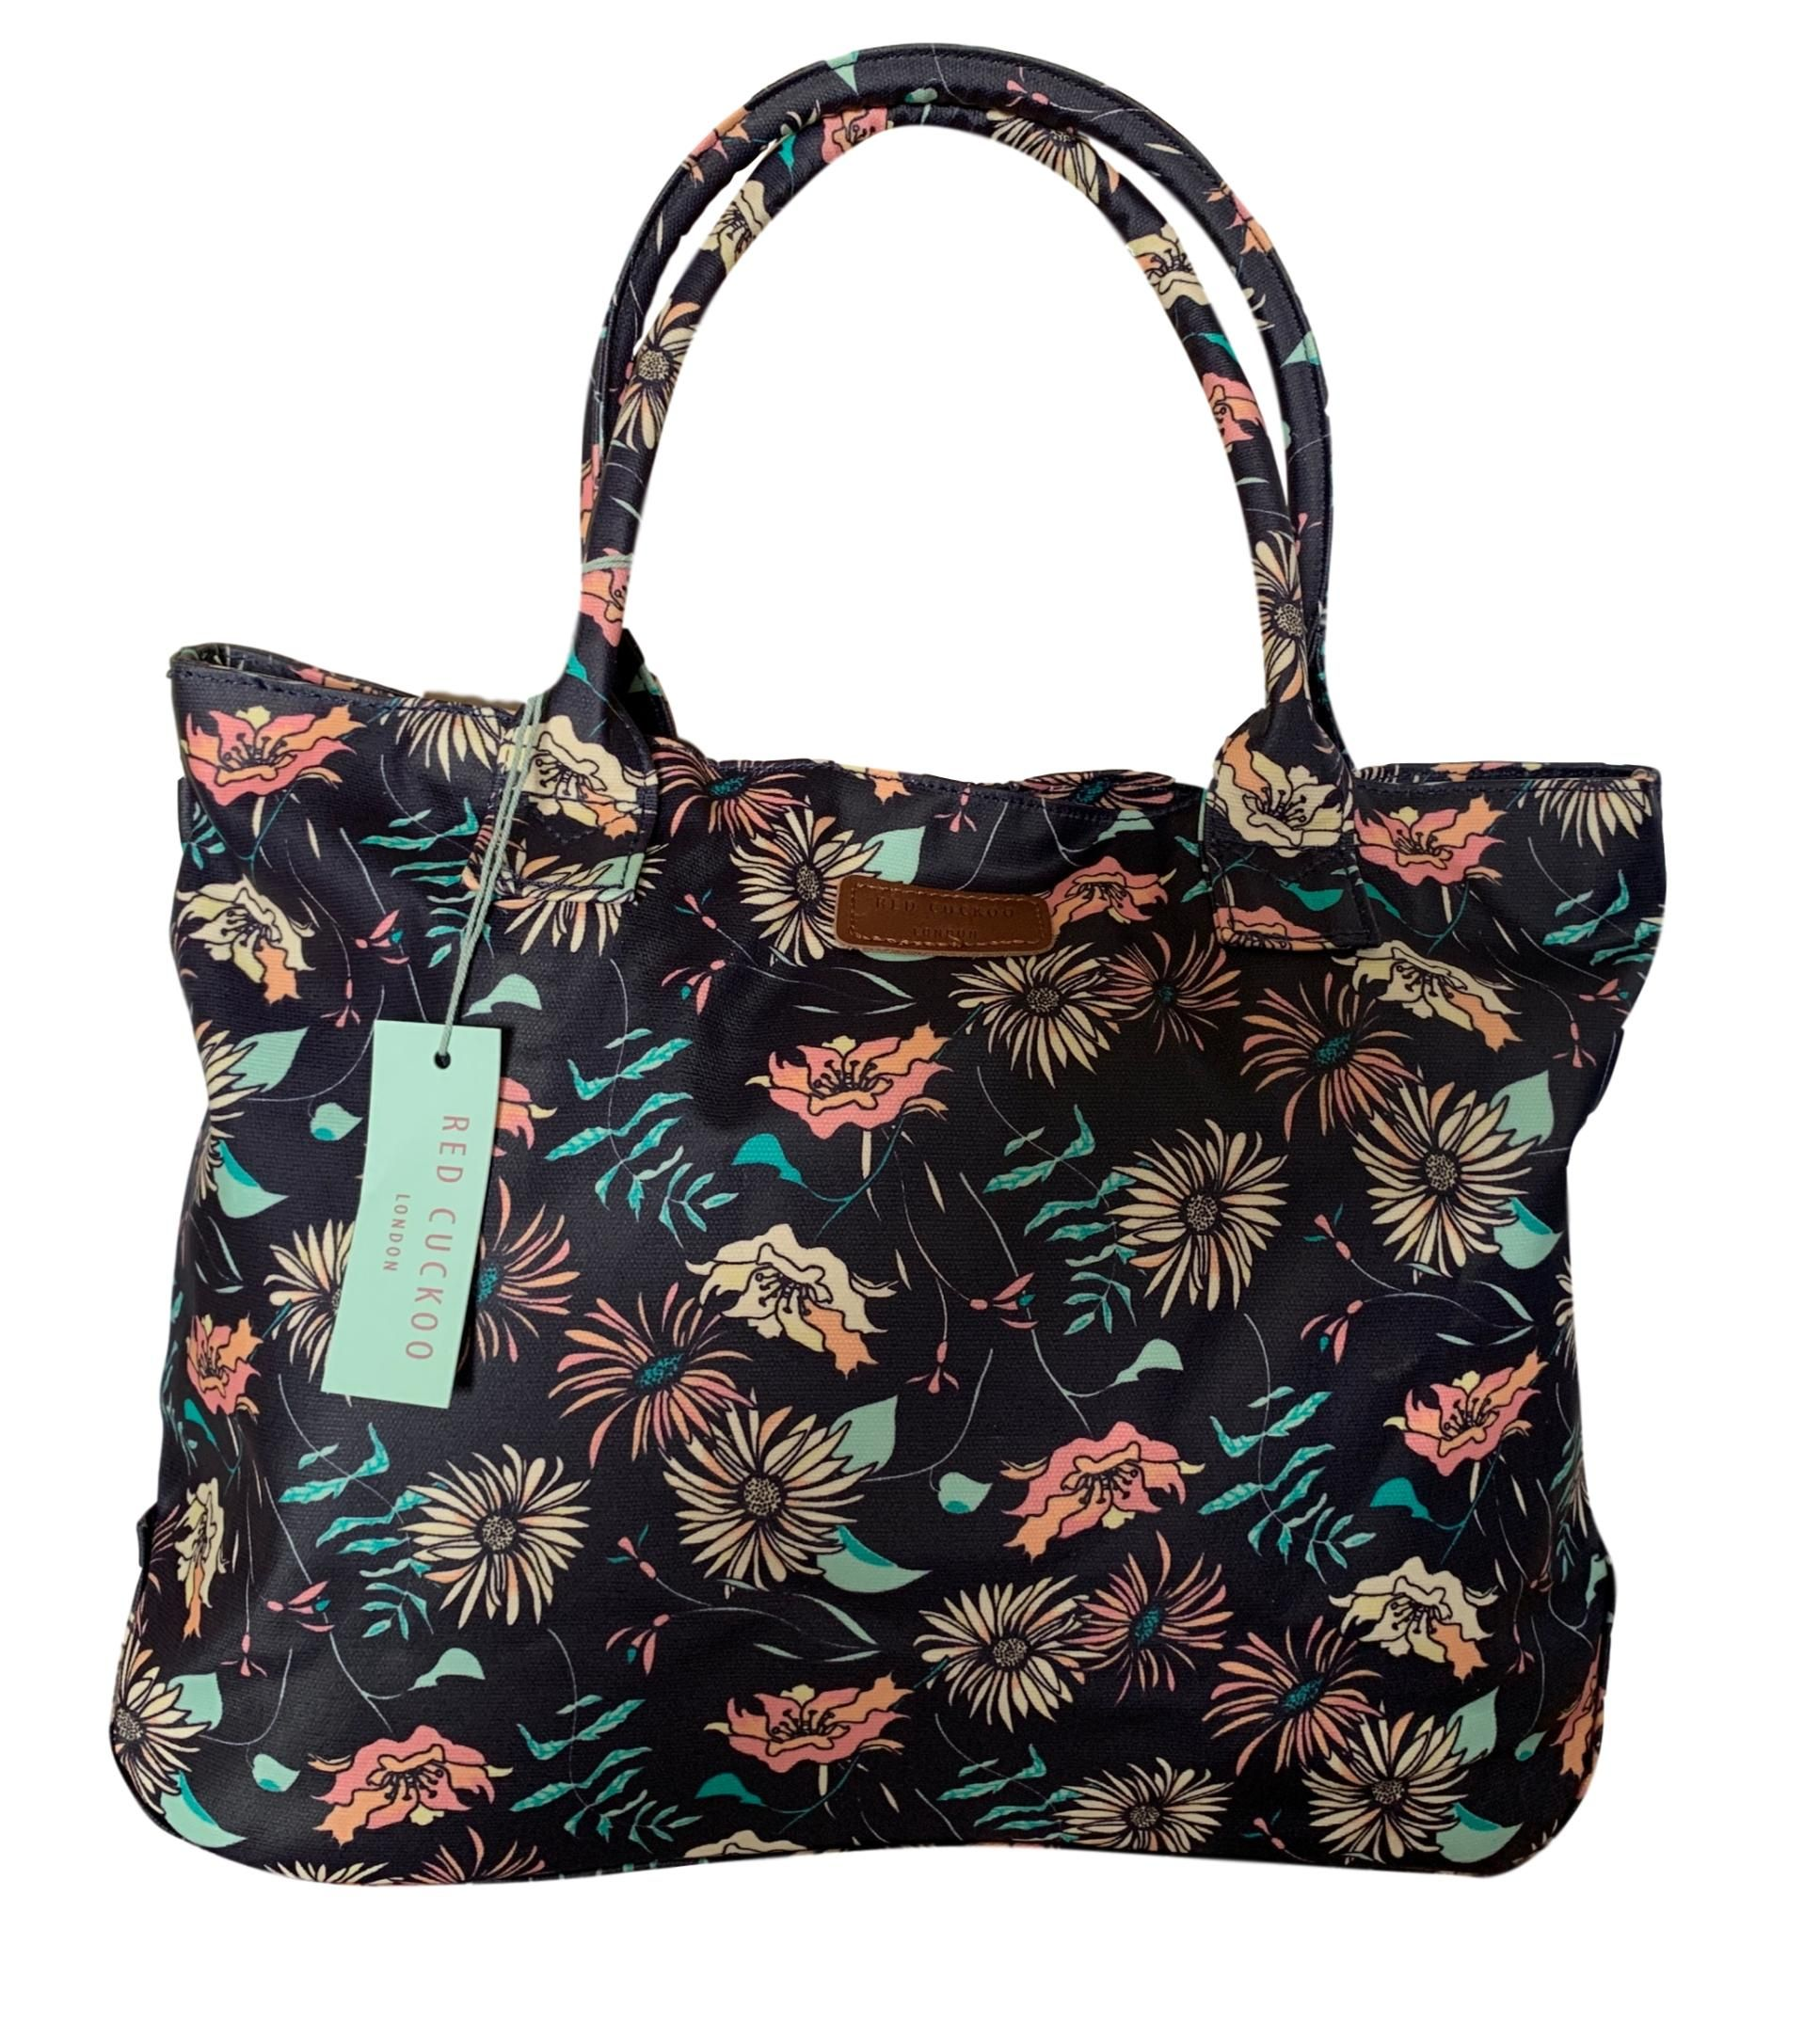 Ladies Women Large Printed Canvas Shopper Tote Bag Shoulder Holiday Beach Bag